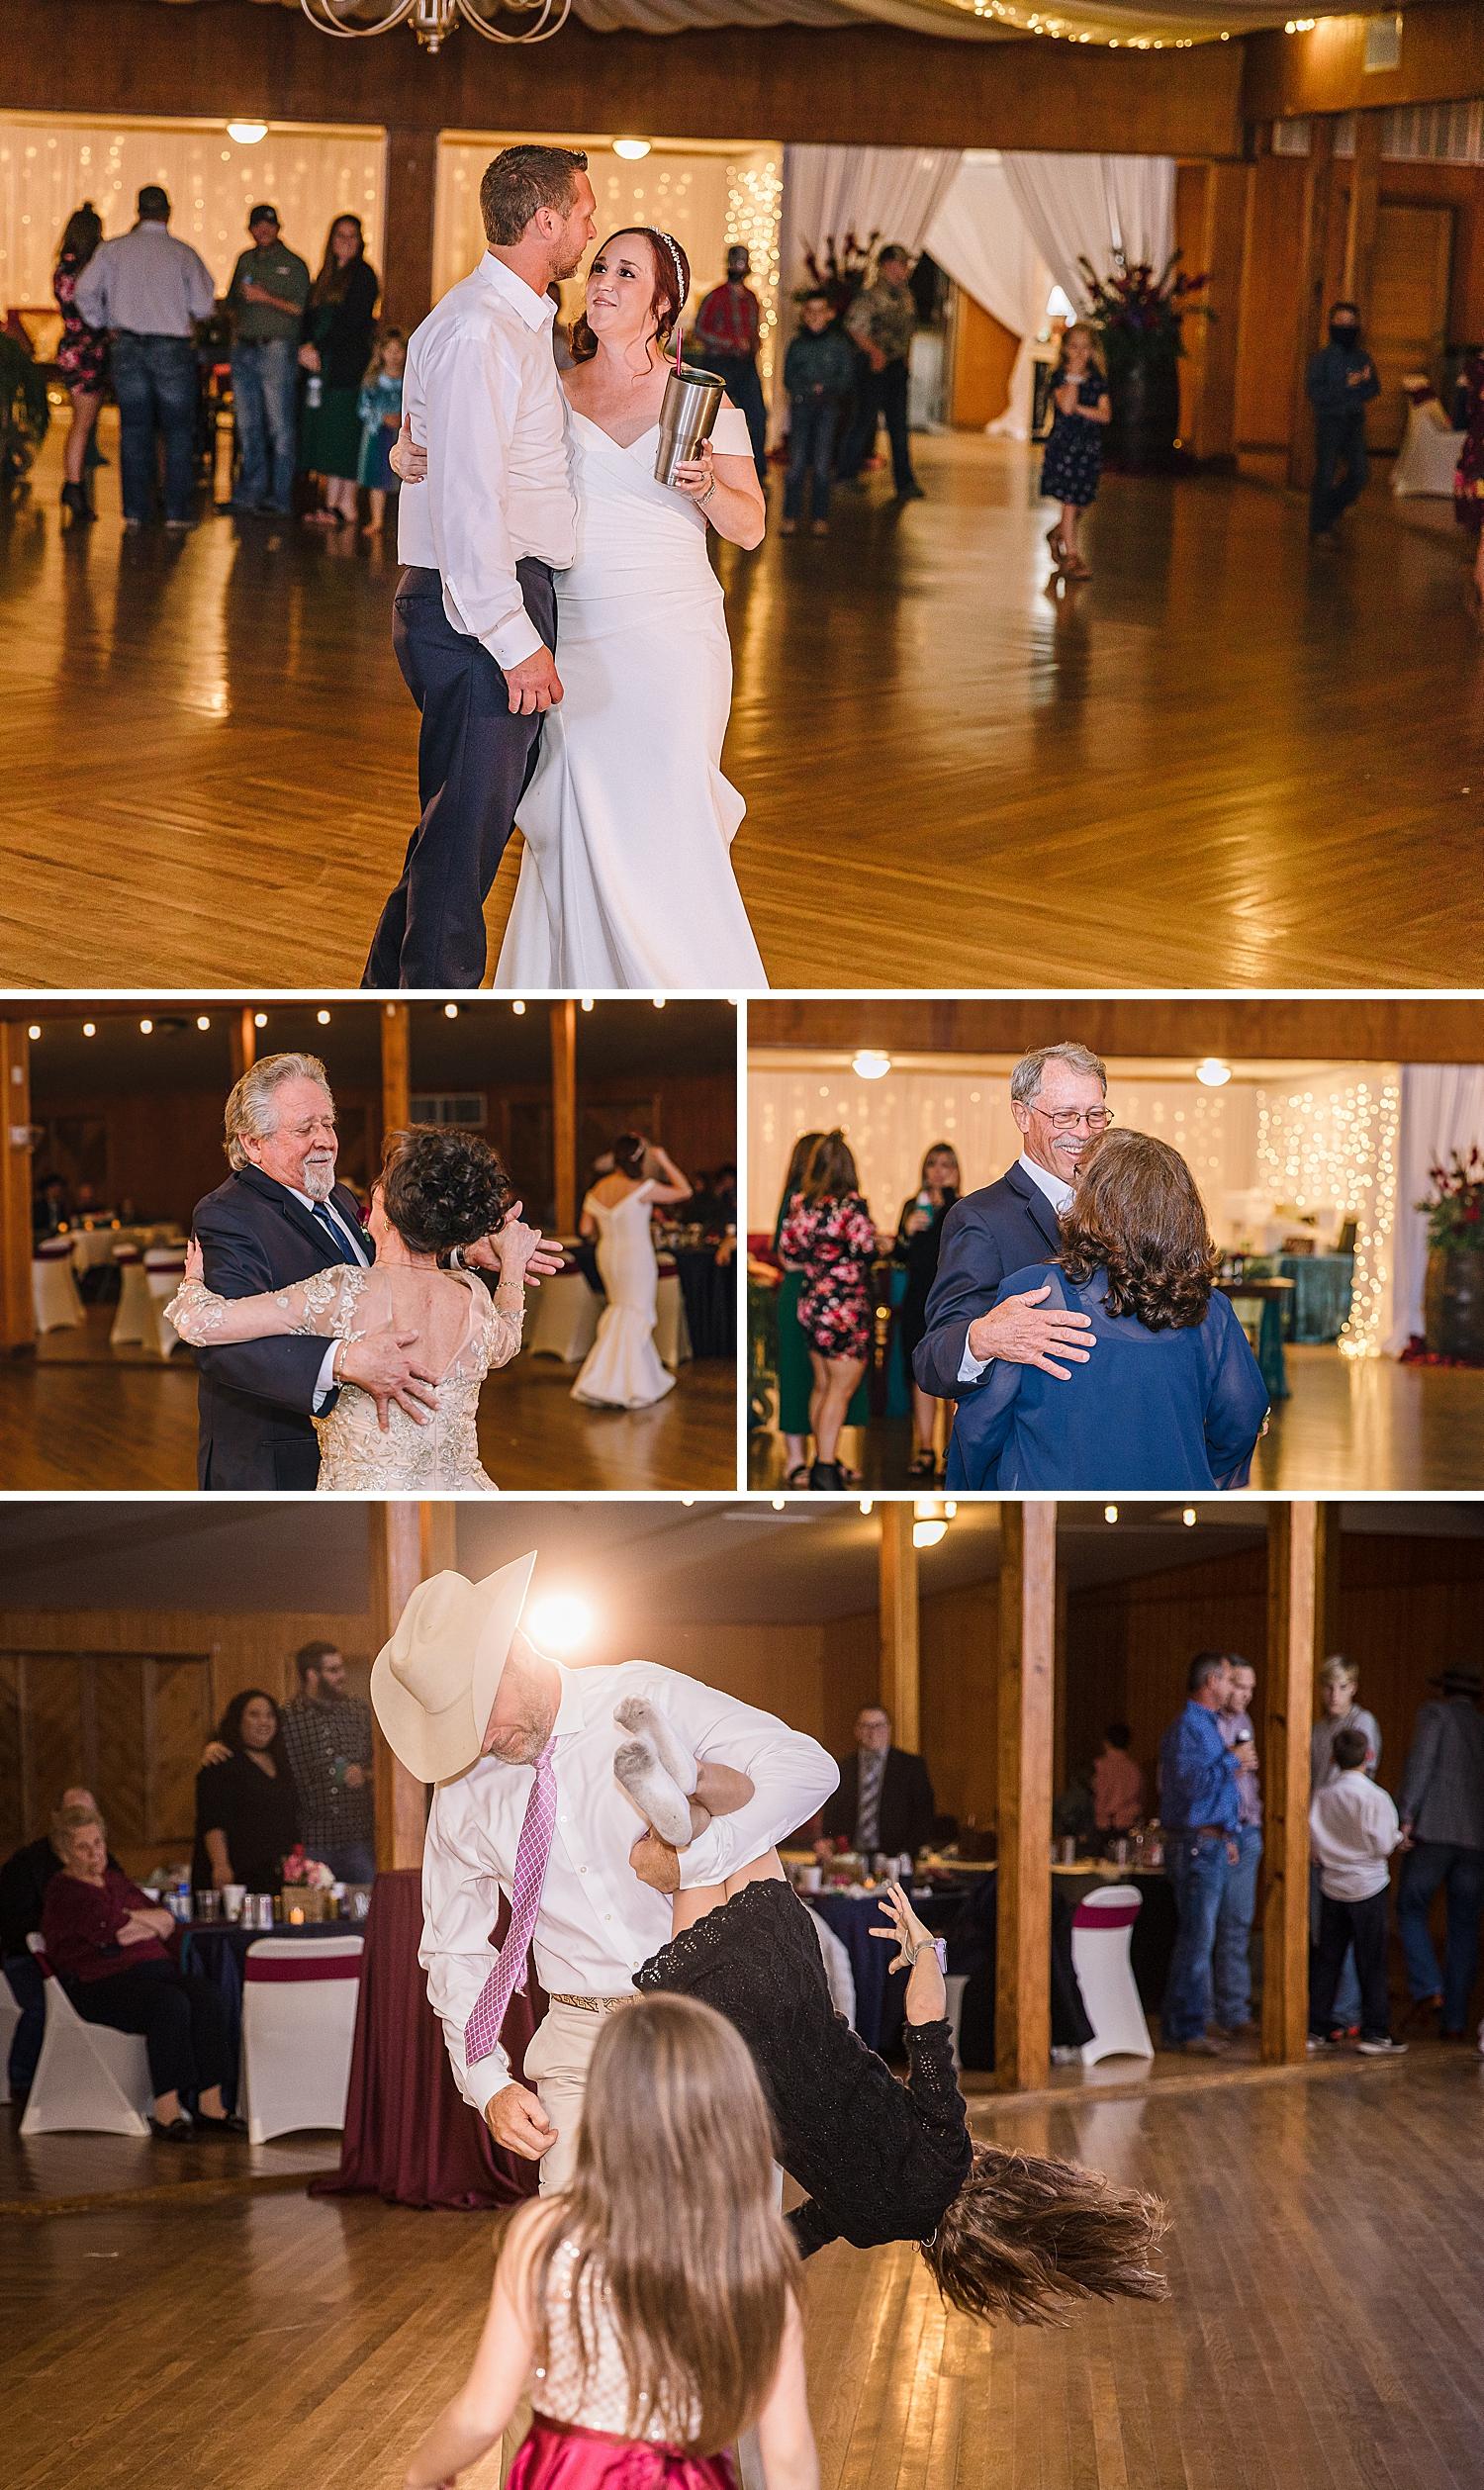 Jewel-Tone-Texas-Wedding-Valerie-Jason-Carly-Barton-Photography_0104.jpg